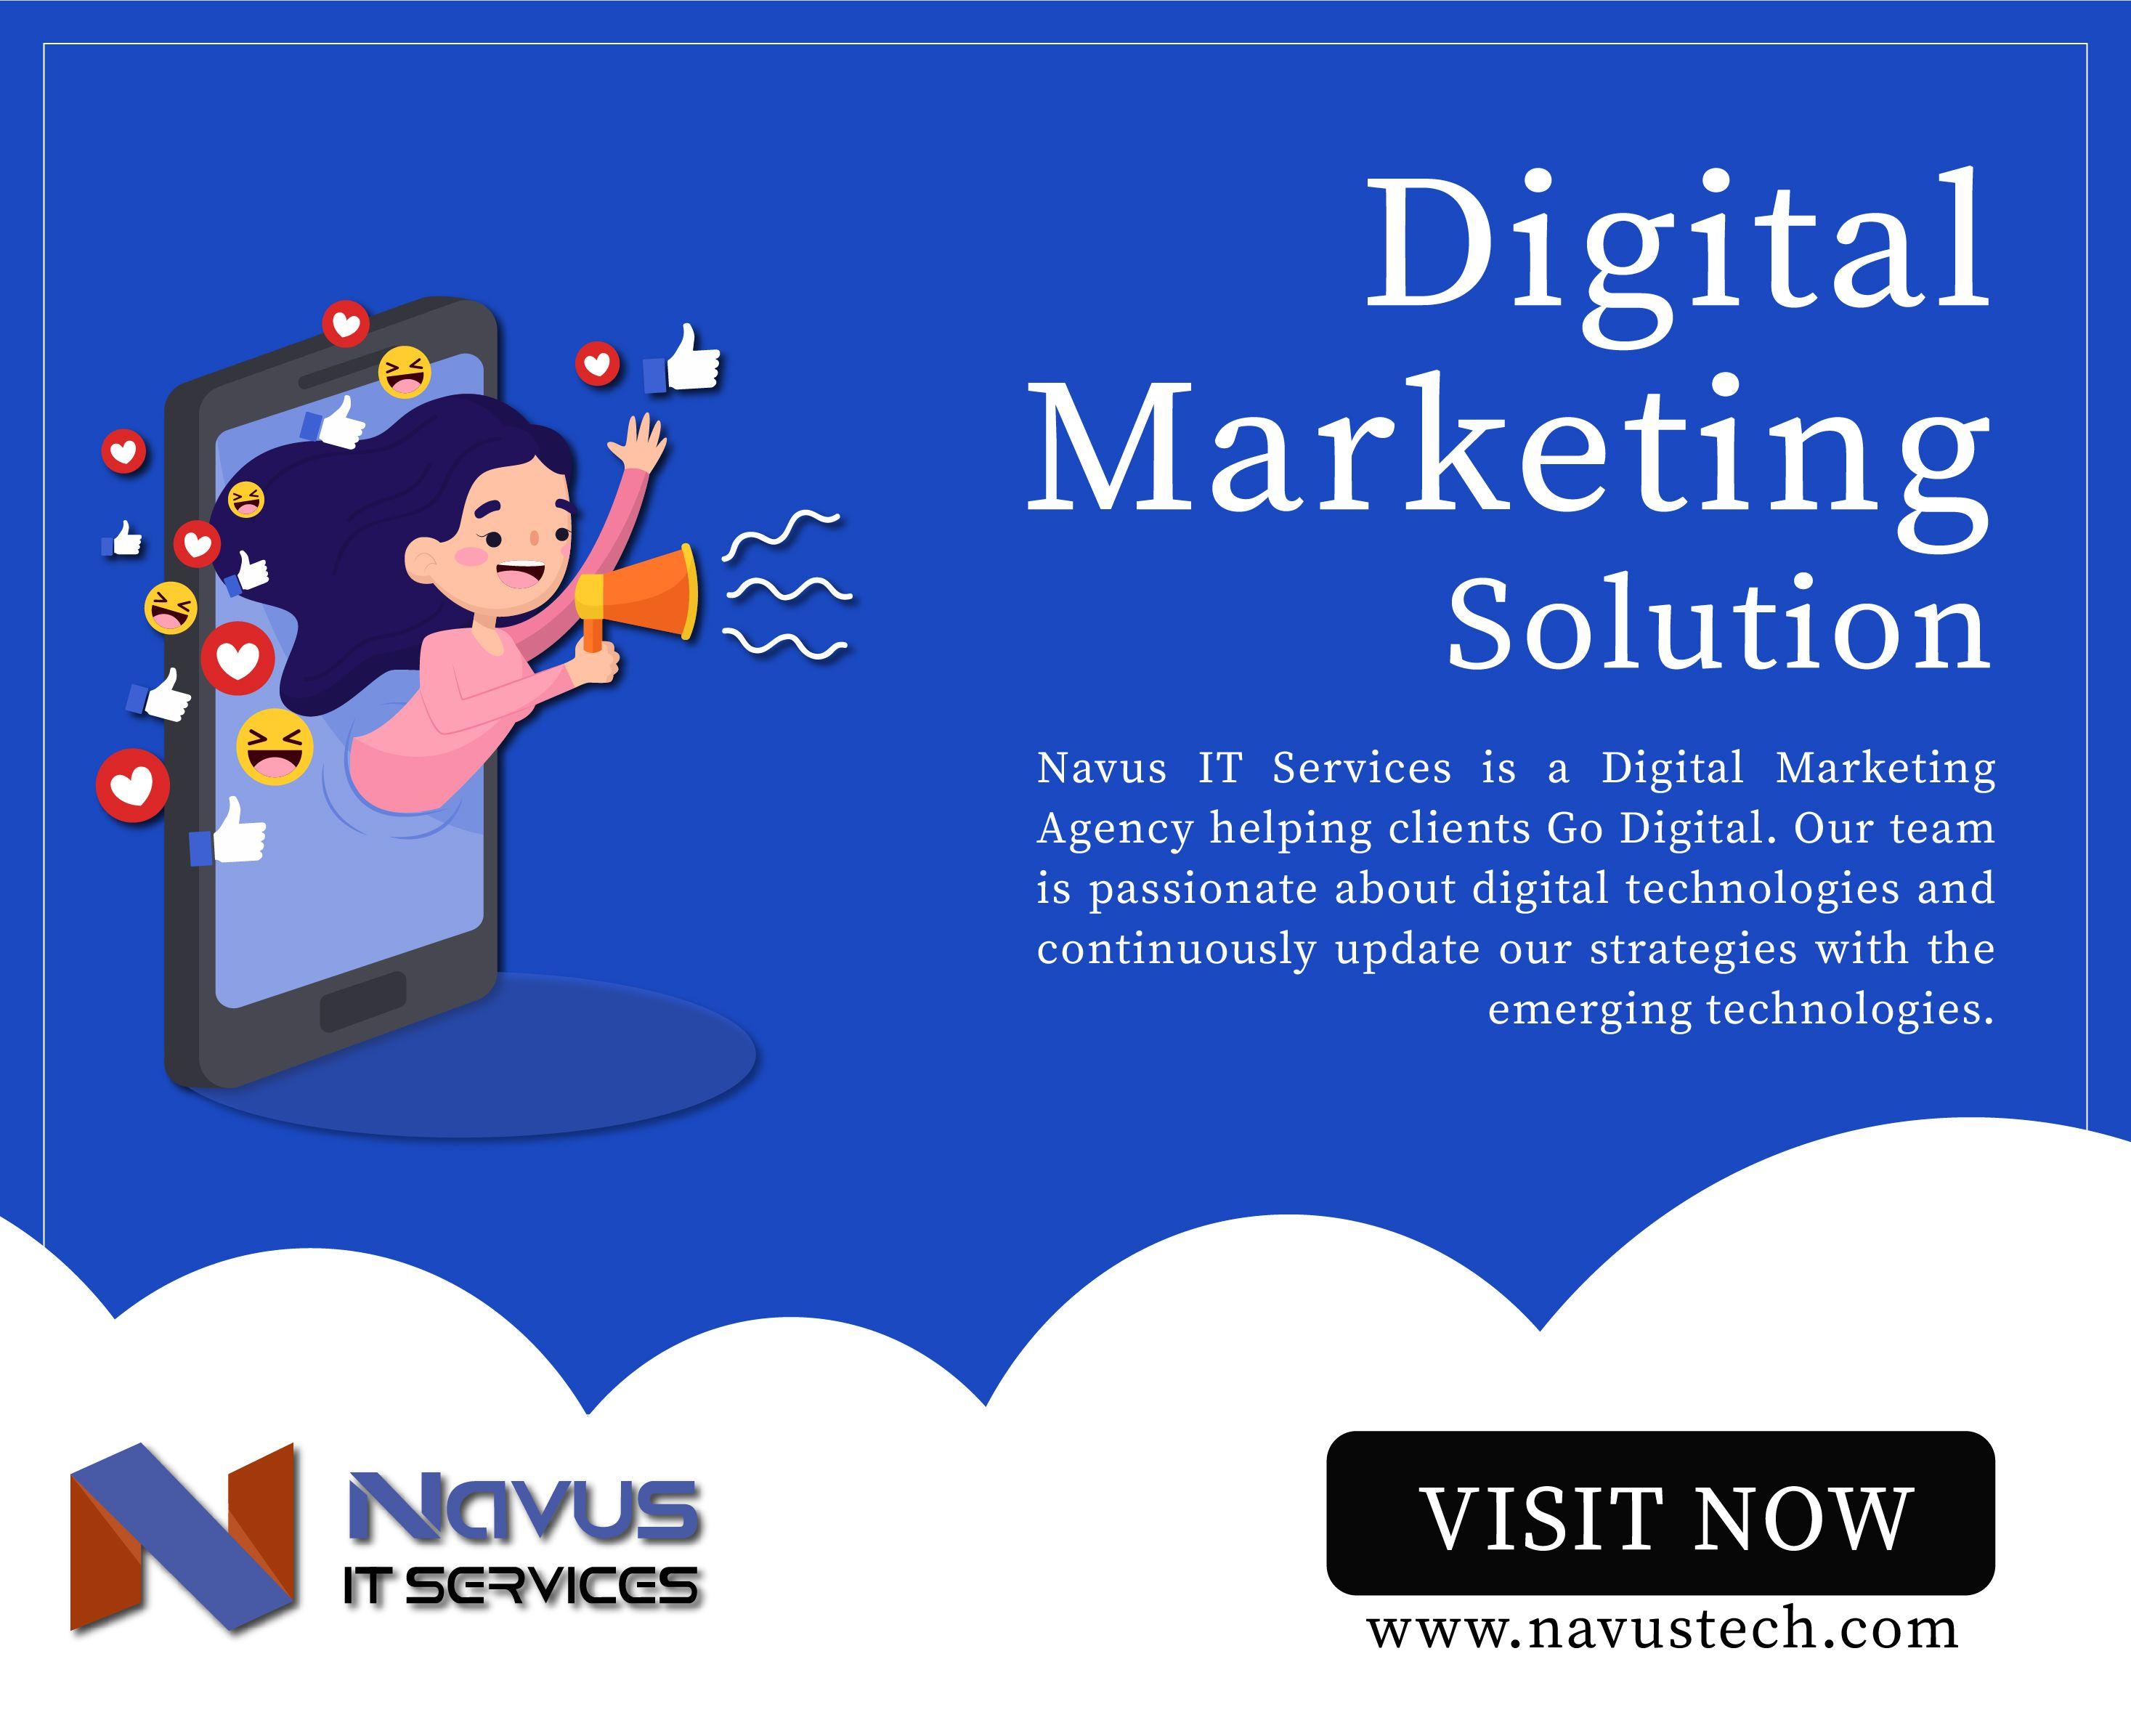 Navus it services delhi ncr is professional web design